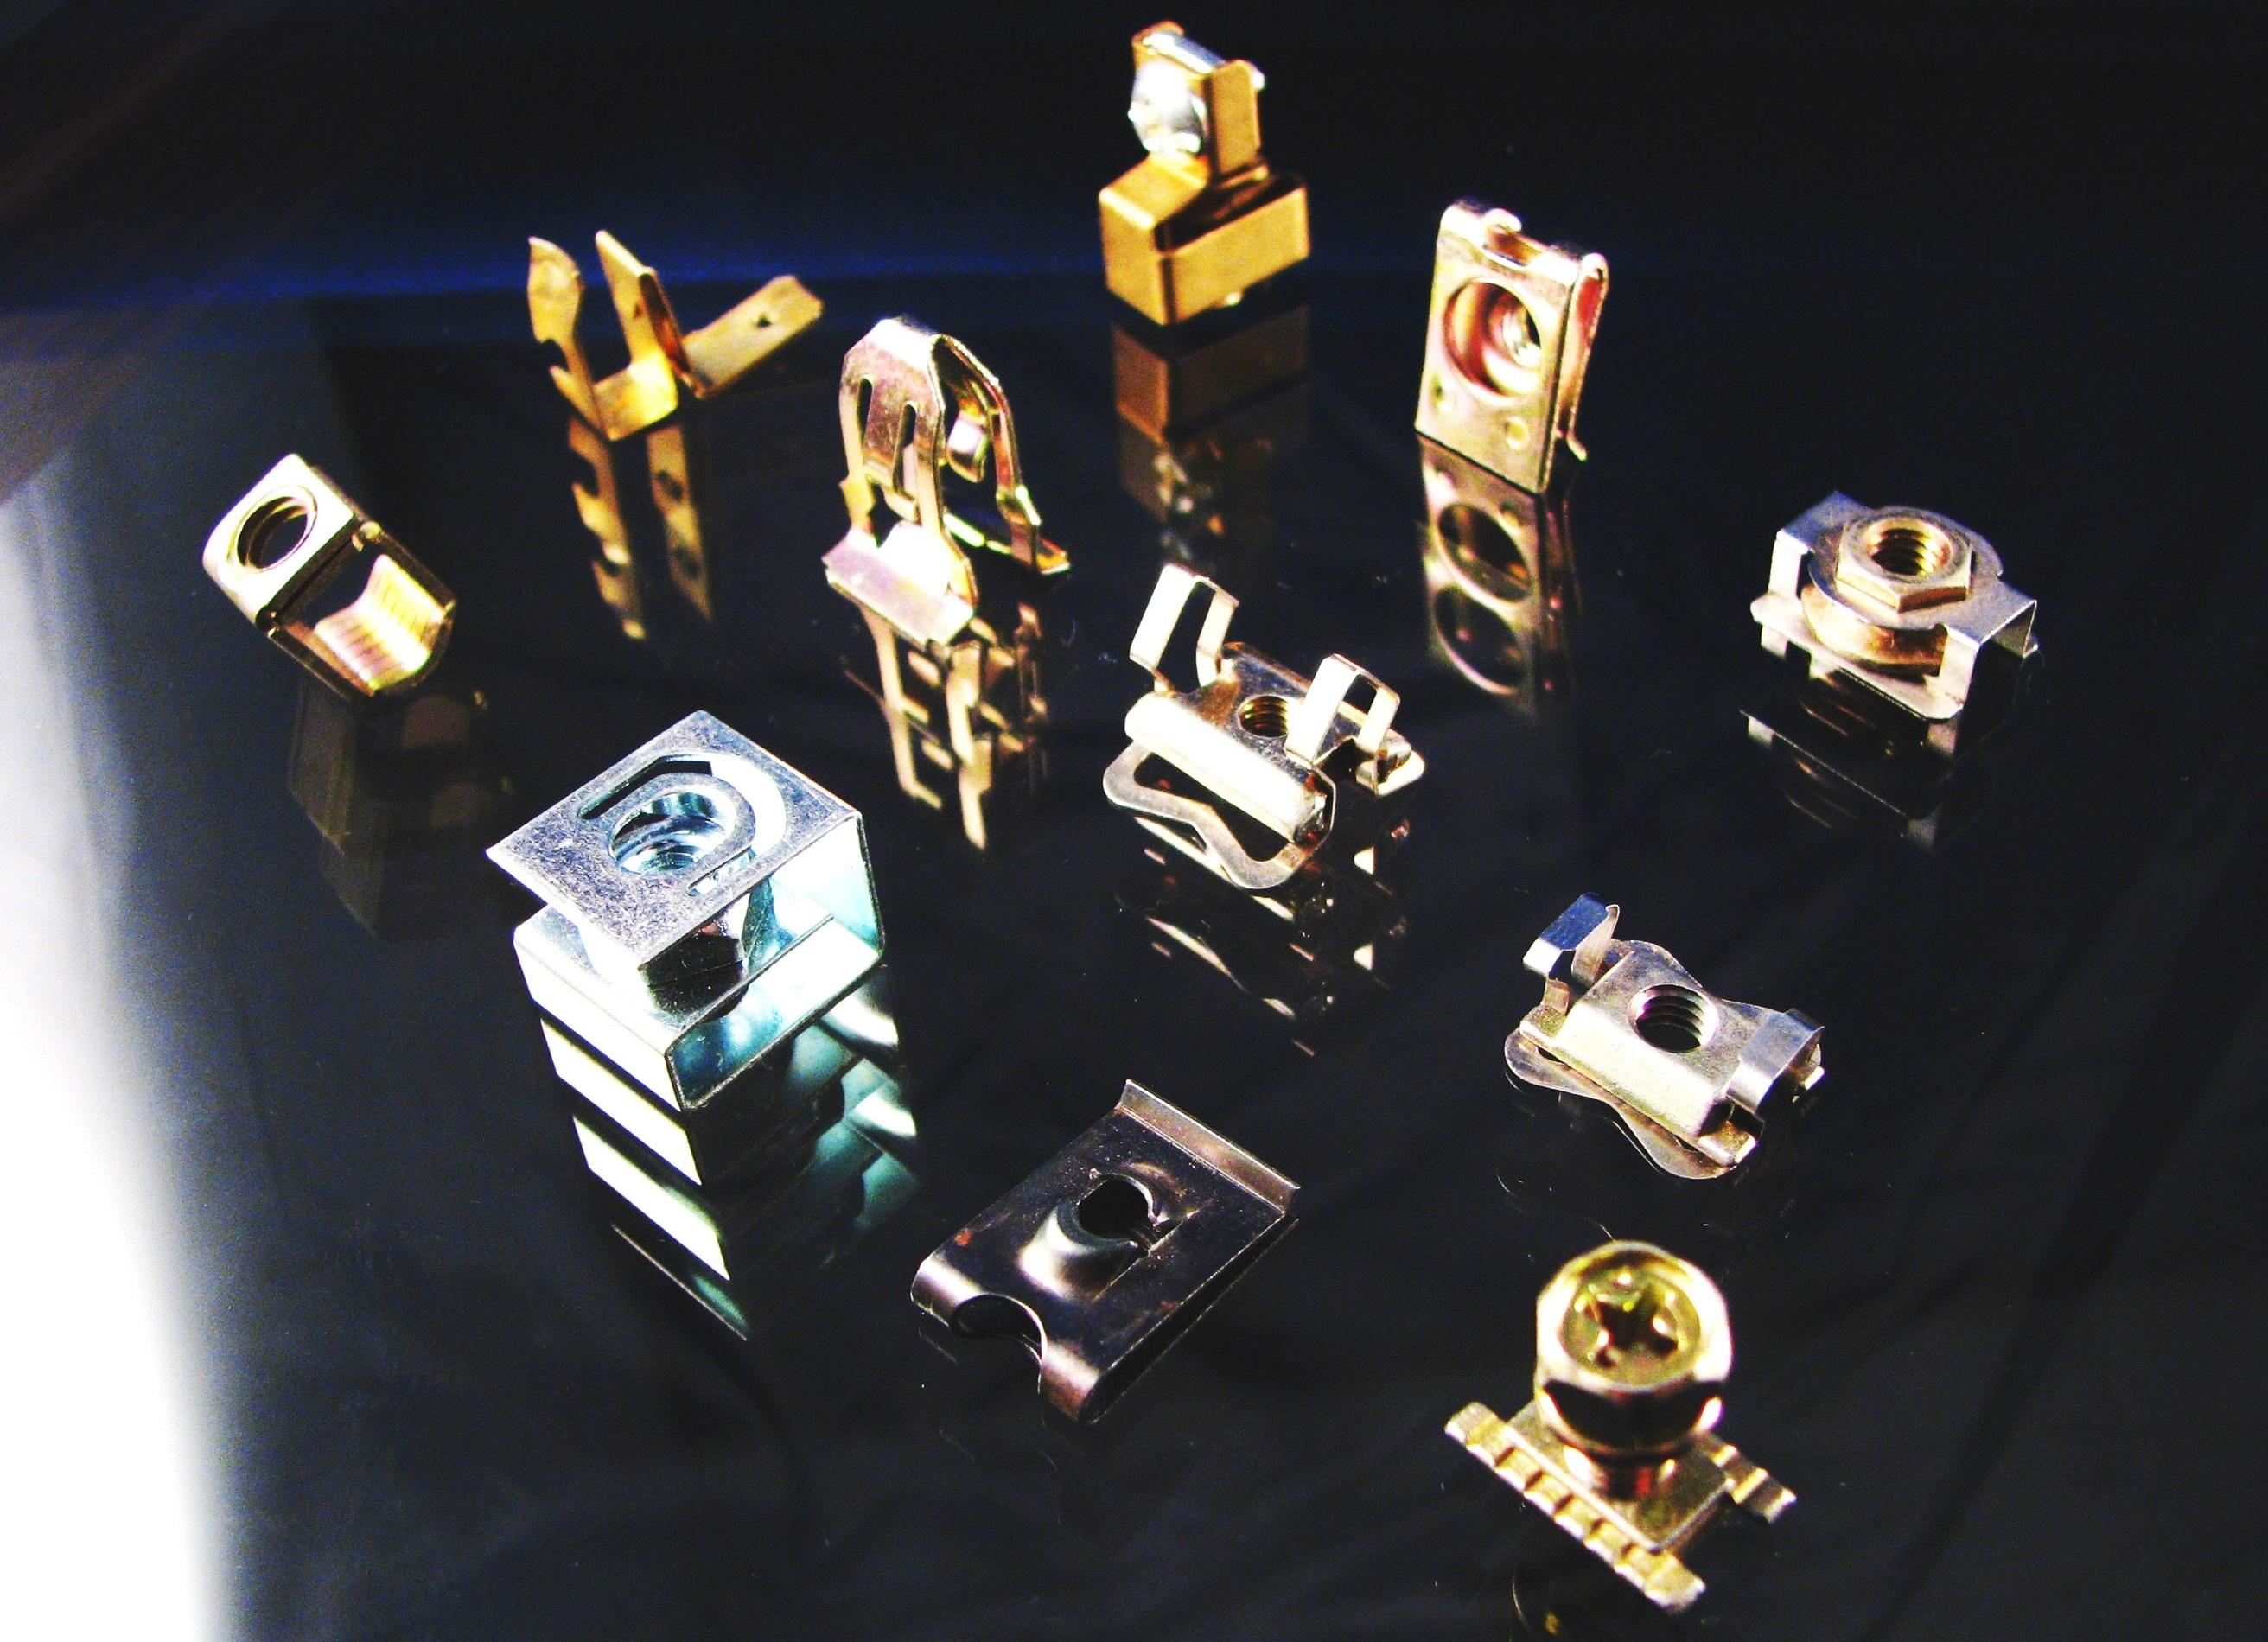 Screws & nuts for automoblie parts